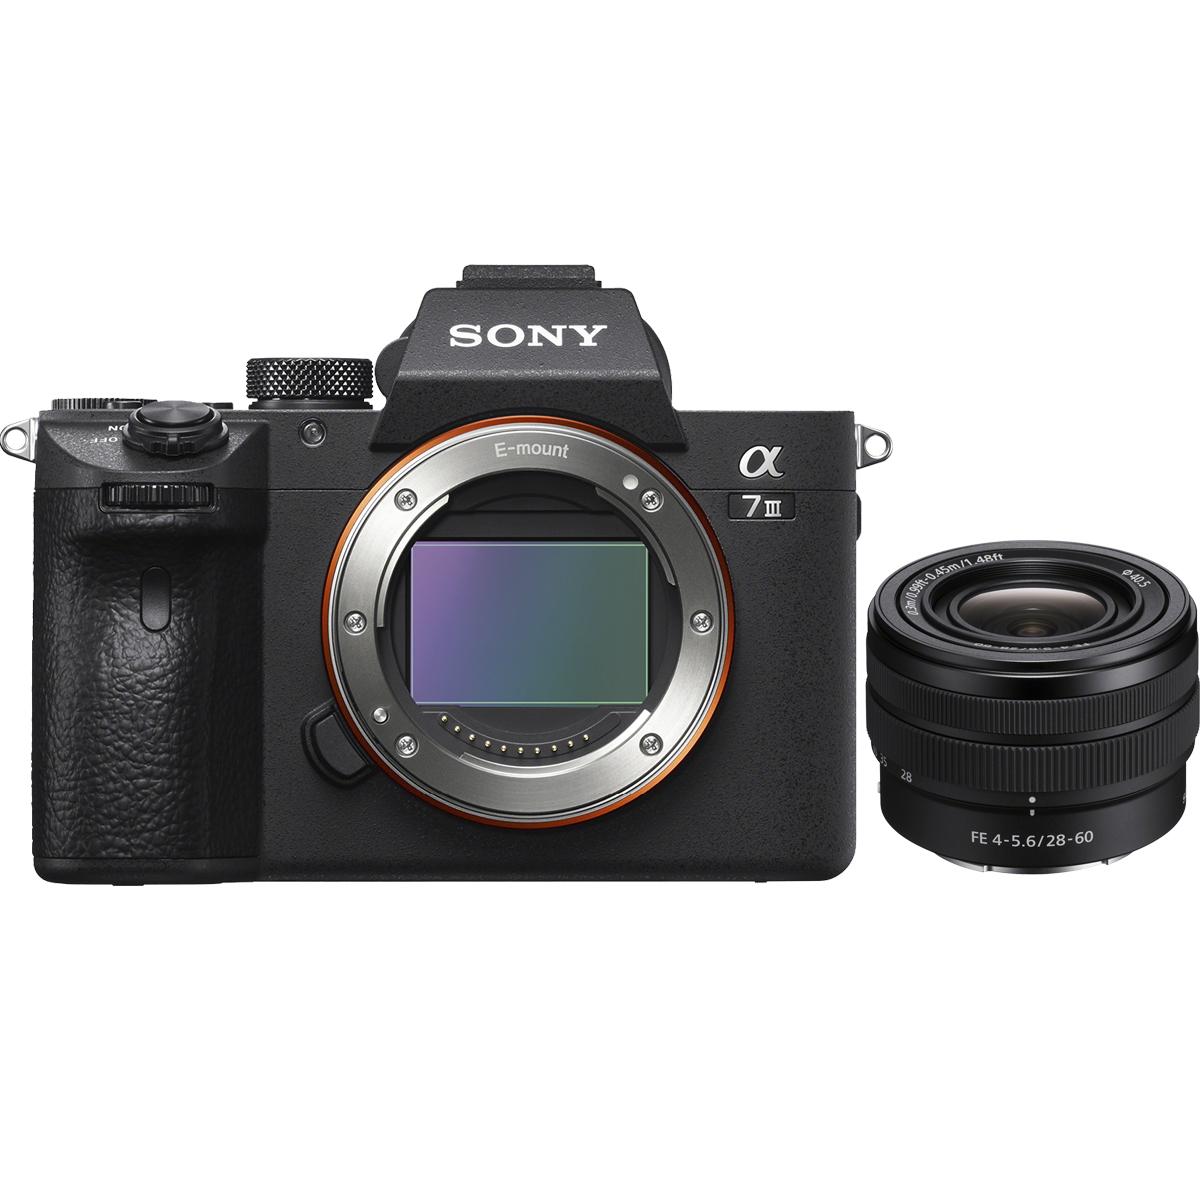 Sony Alpha 7 III Kit mit FE 28-60 mm 1:4,0-5,6